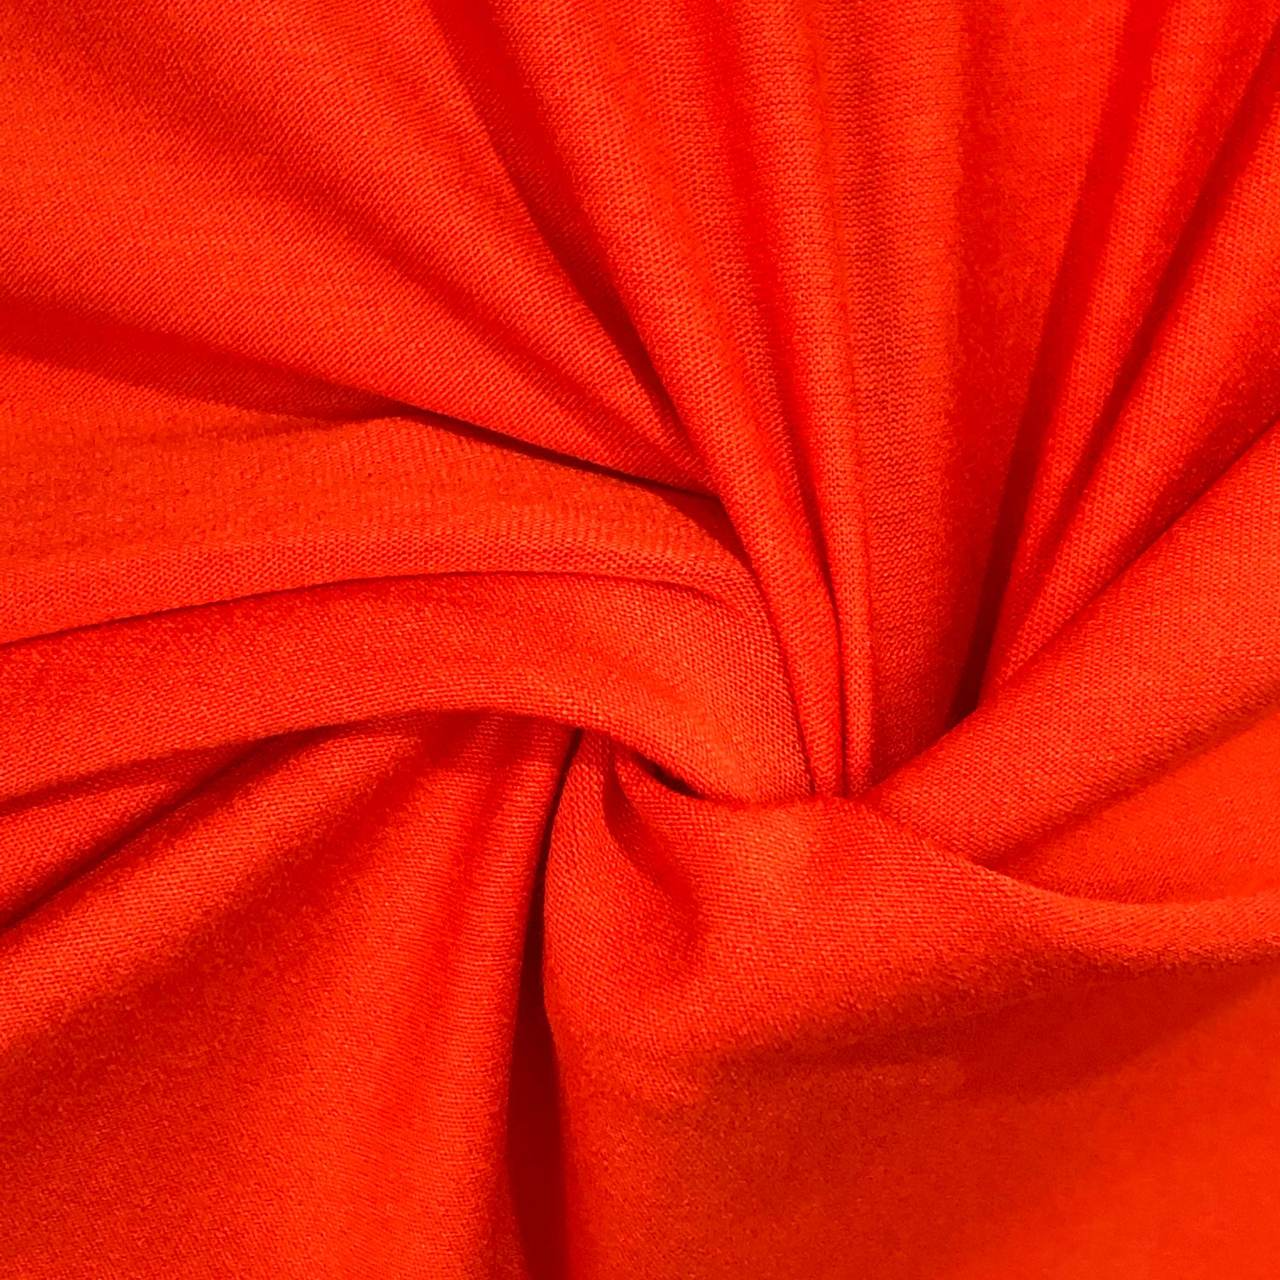 Tecido Malha Viscolycra  92%Viscose 8%Elastano Laranja